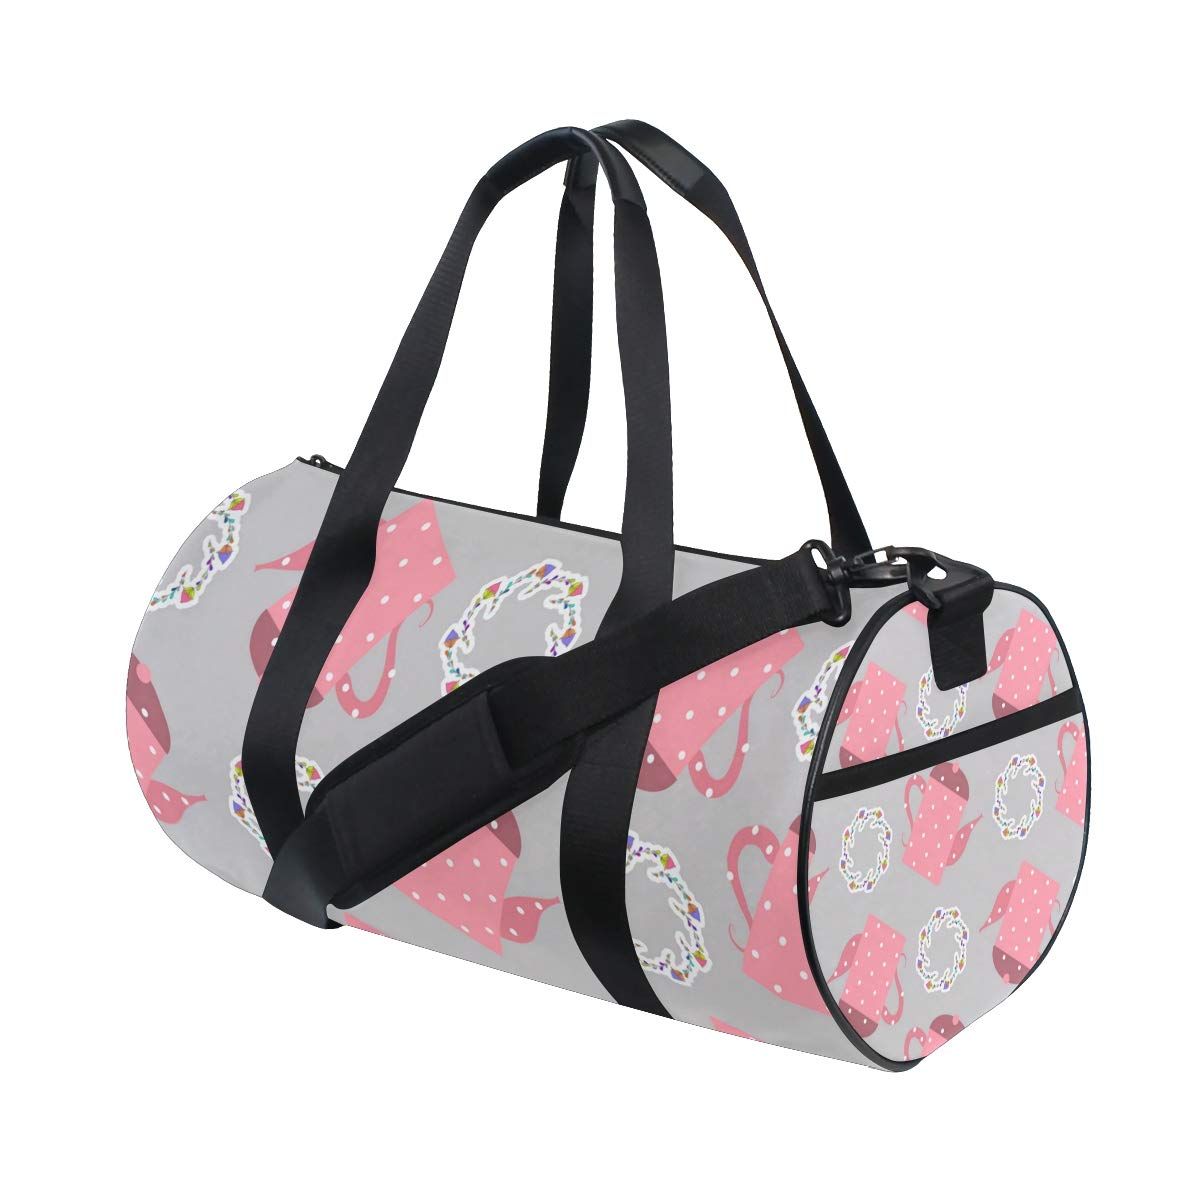 Gray Teapot Ceramic PictureWaterproof Non-Slip Wearable Crossbody Bag fitness bag Shoulder Bag